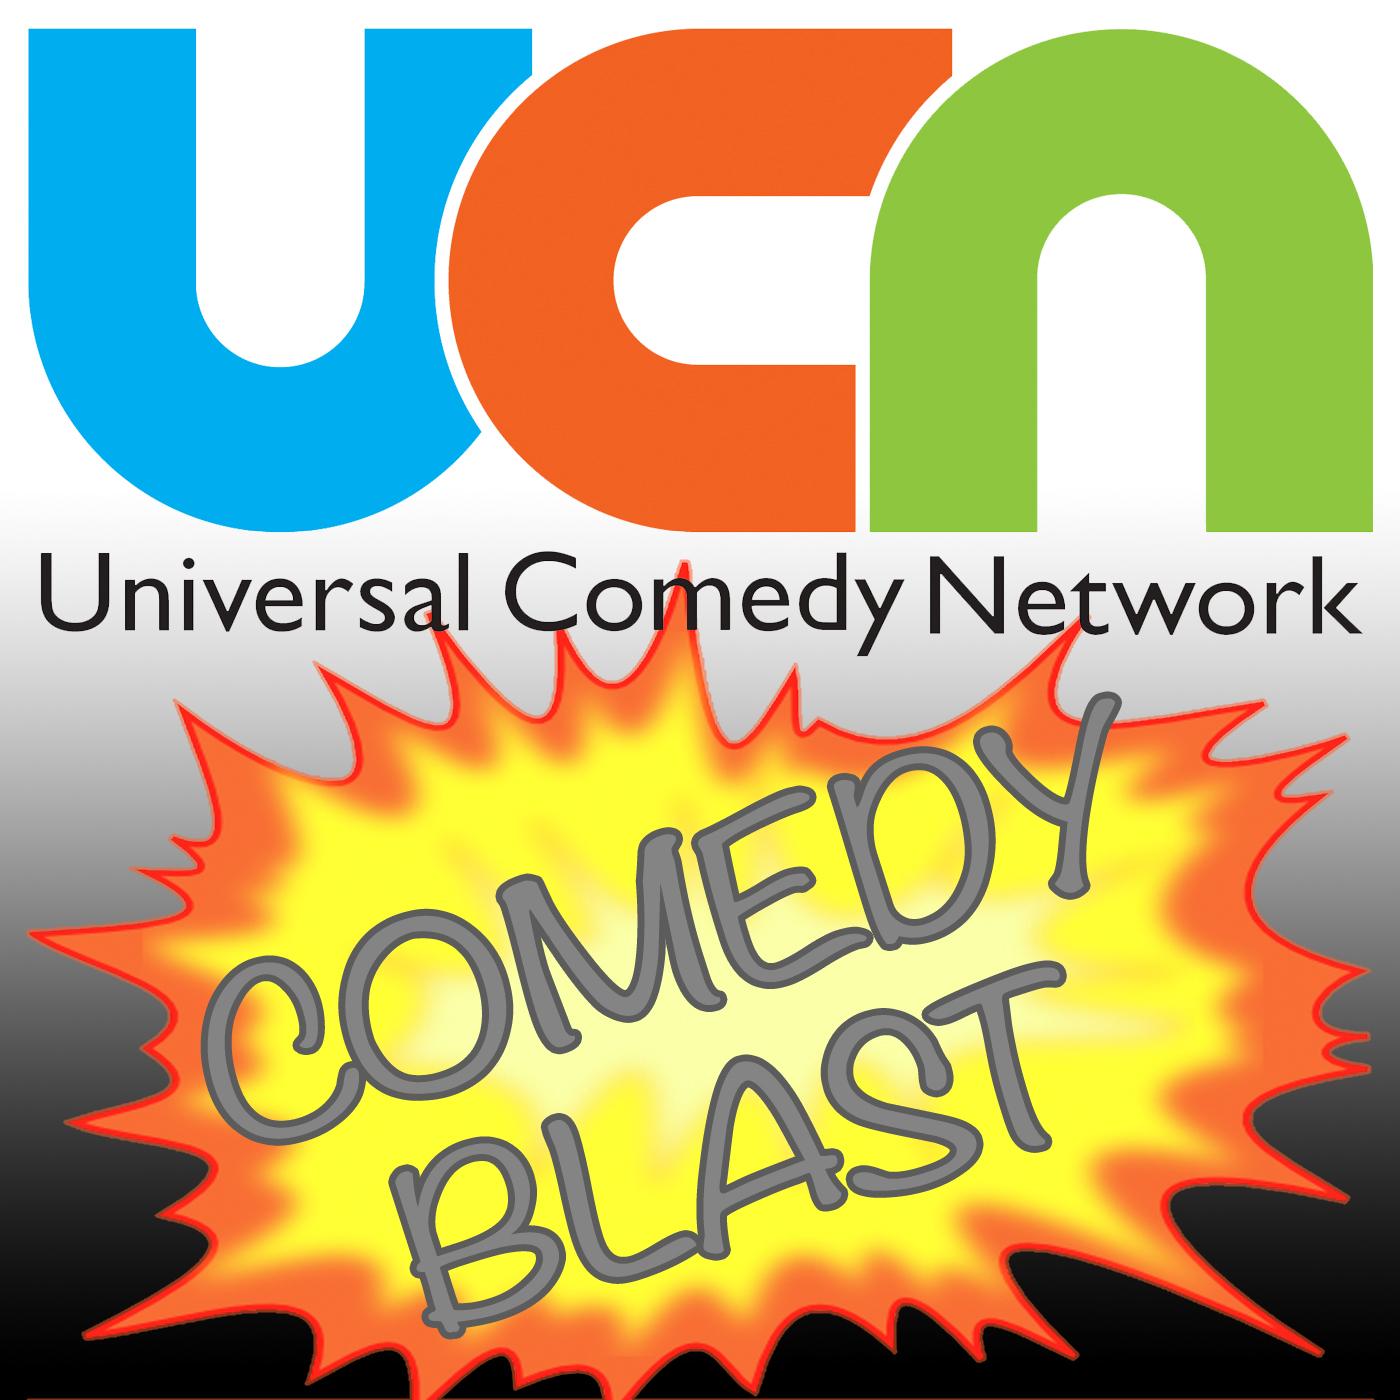 Universal Comedy Network's Comedy Blast